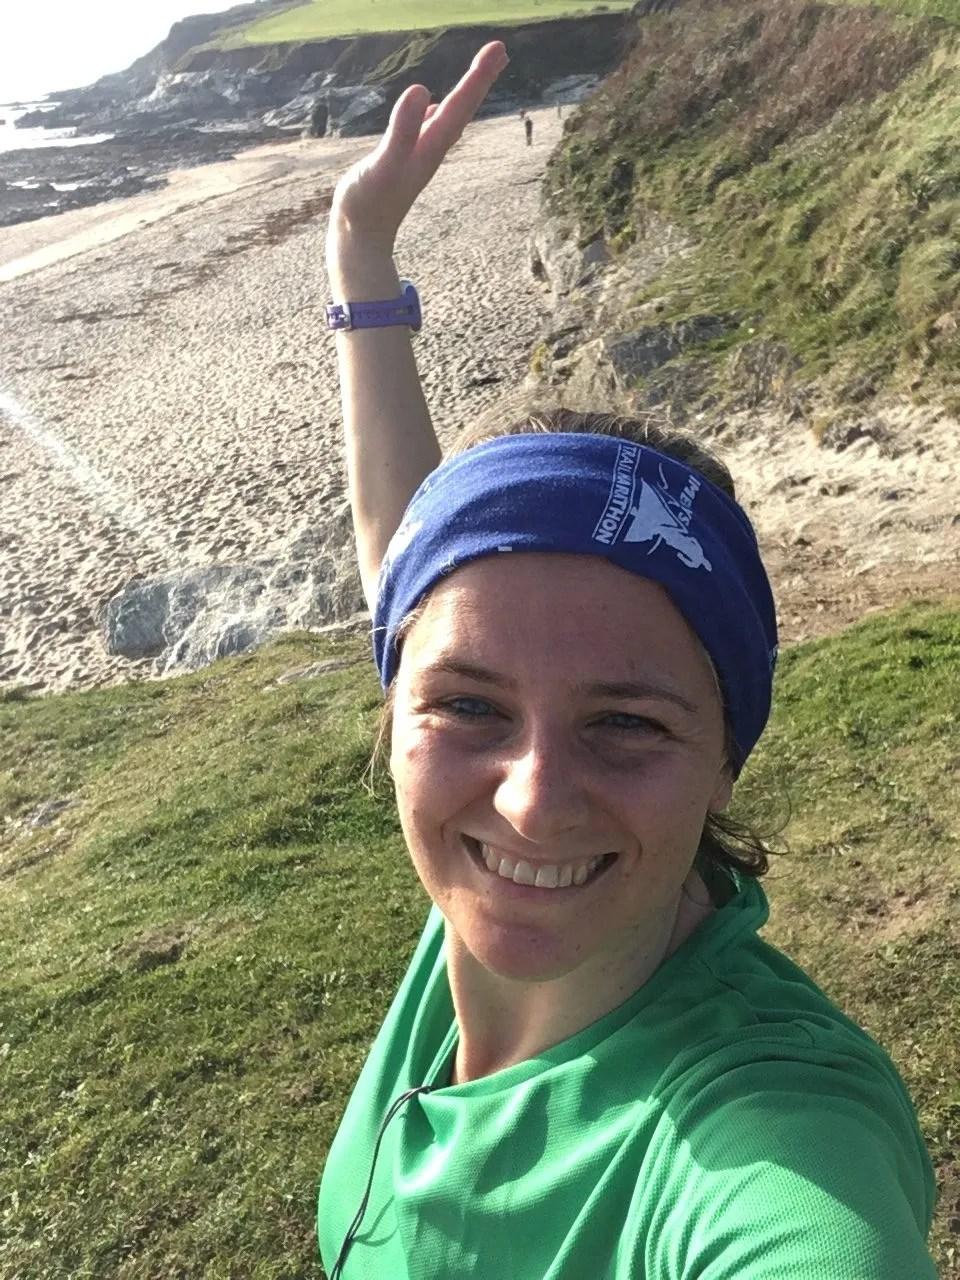 Running +goals+2018+Ultrarunning+Ultramarathon+Marathon+Trail+Running+Runner+Womens+Running+Inspiration